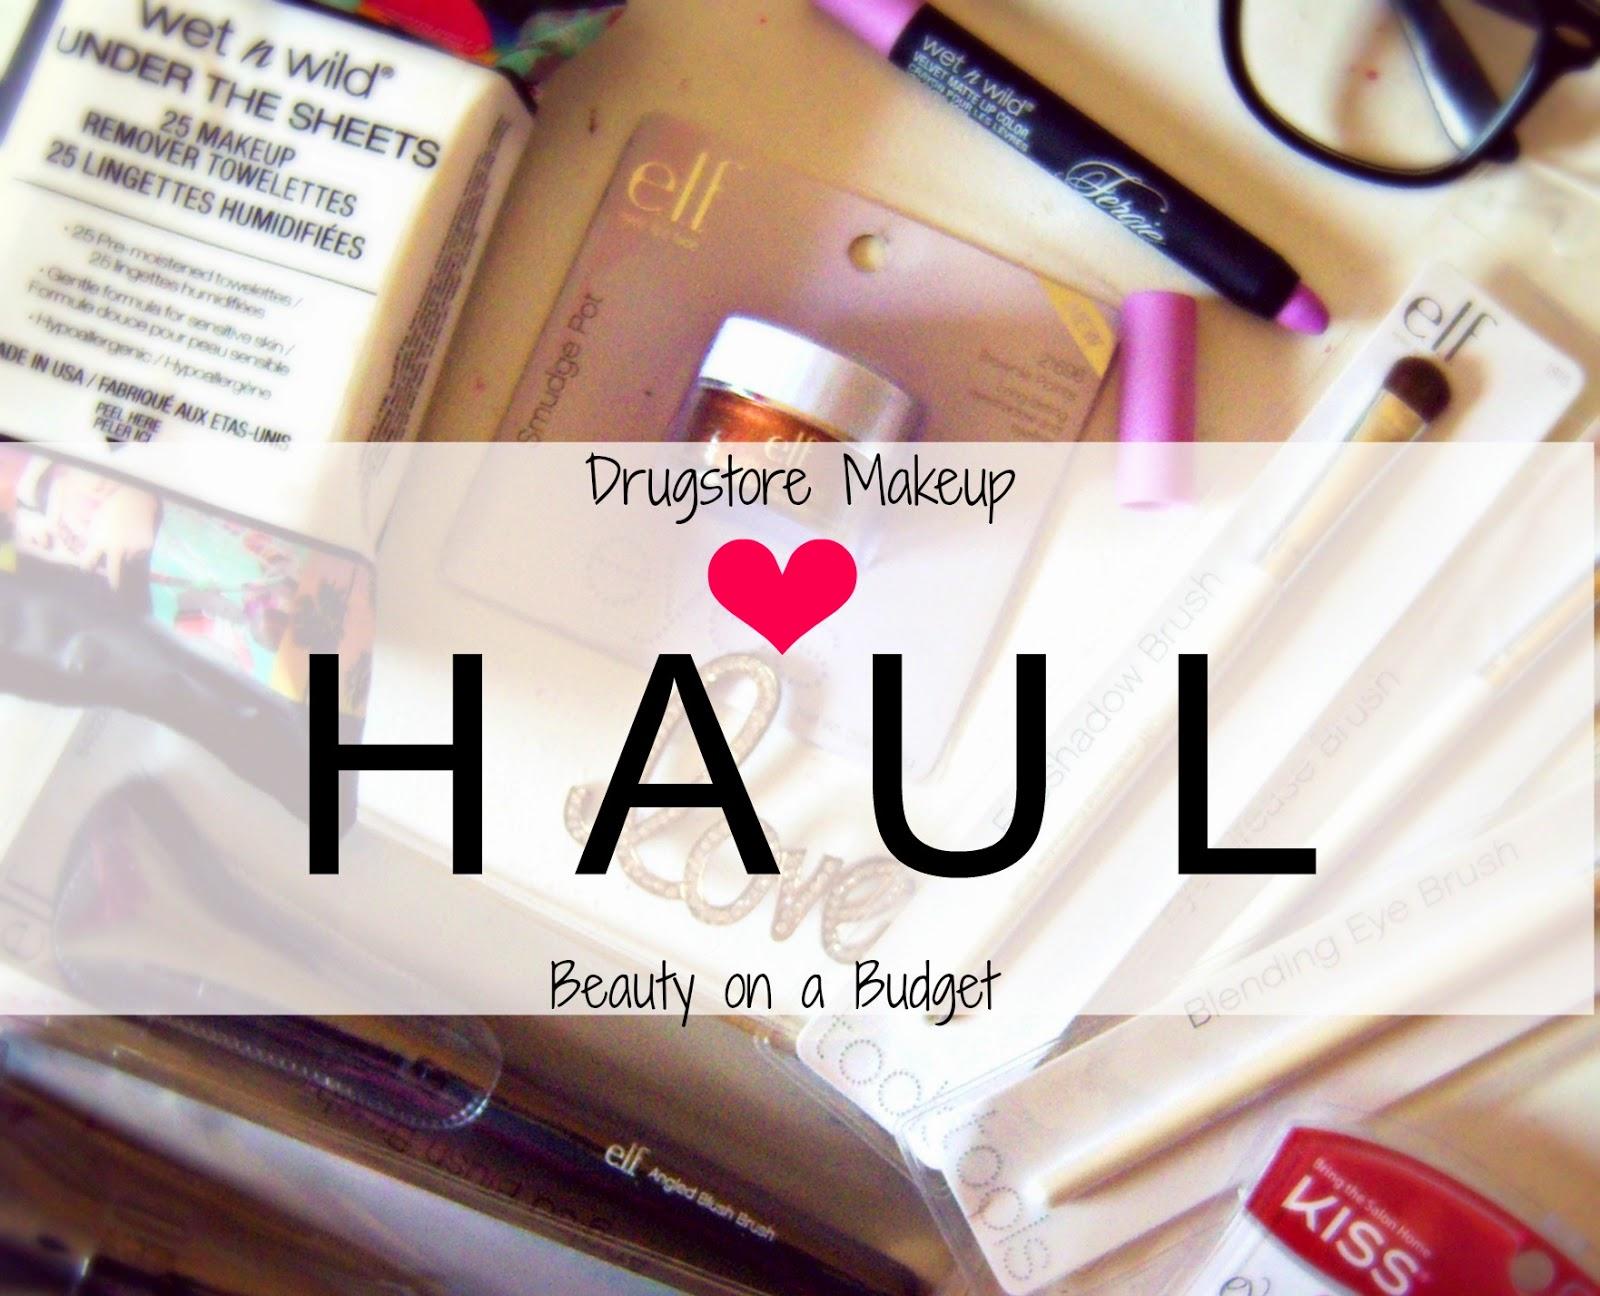 Drugstore Haul – Elf Cosmetics/Wet n Wild